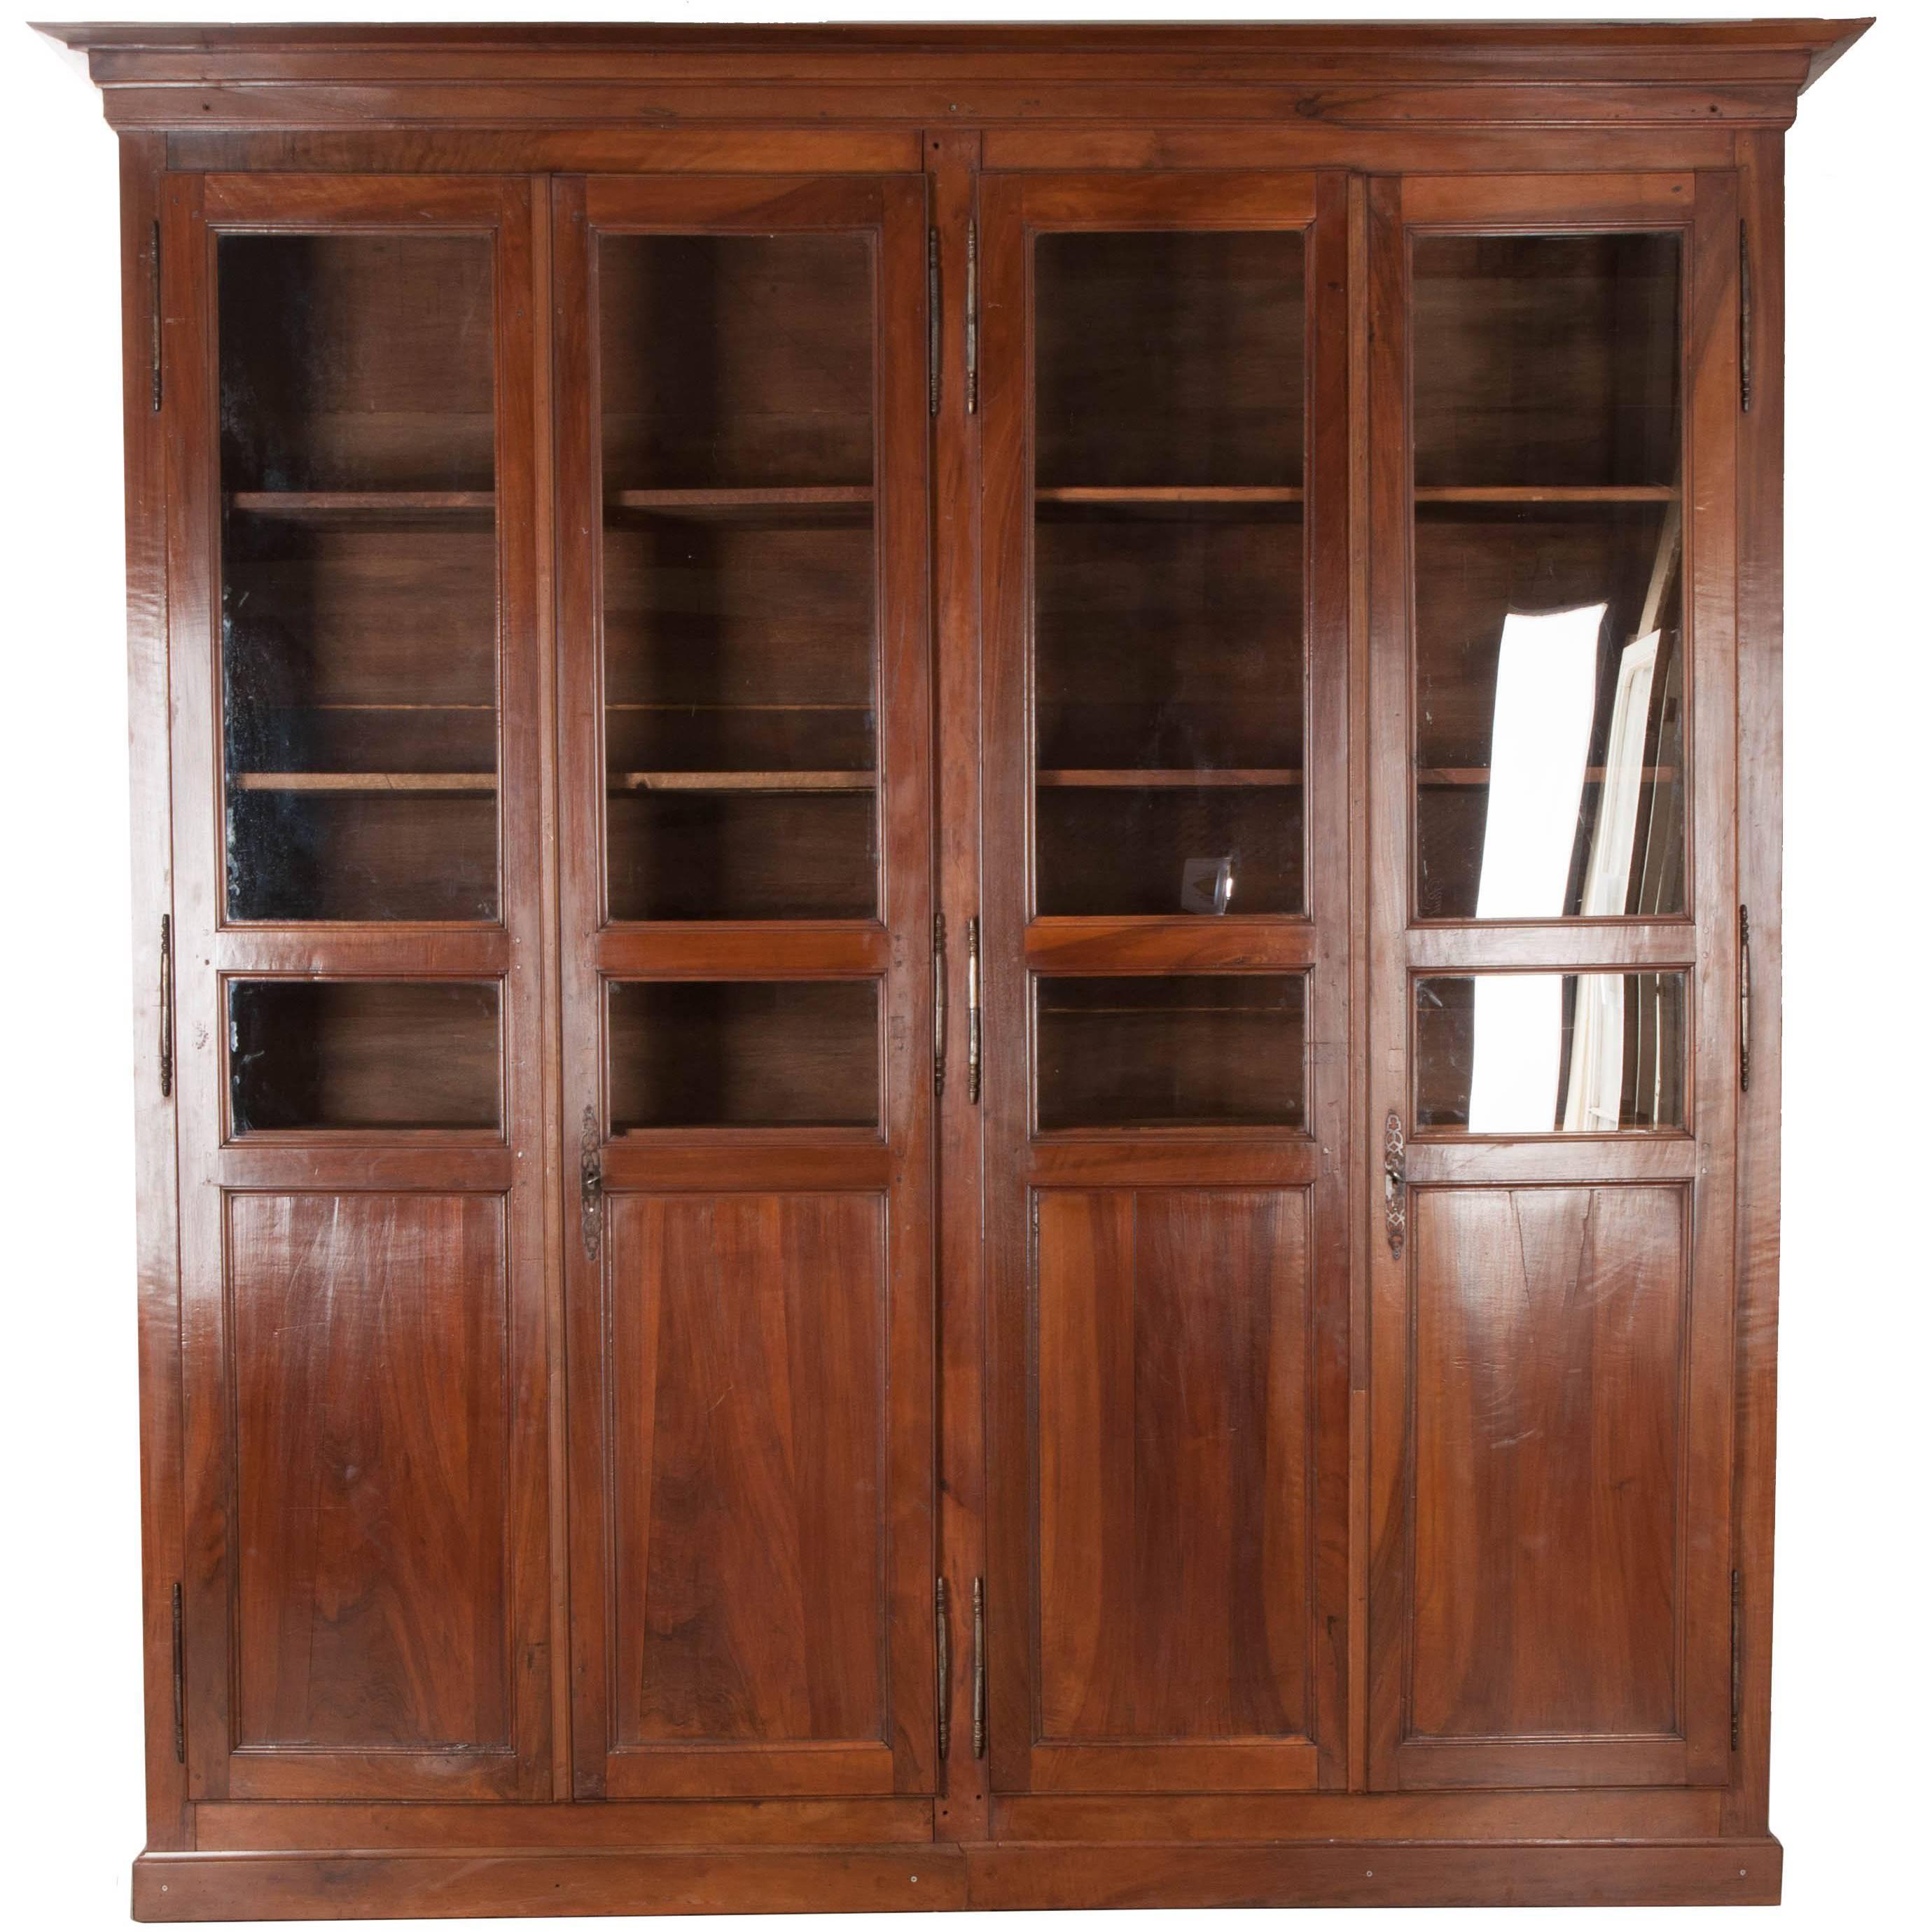 bookcases furniture circular of america less industrial bookcase bookshelves for grey diovani dark black pin metal